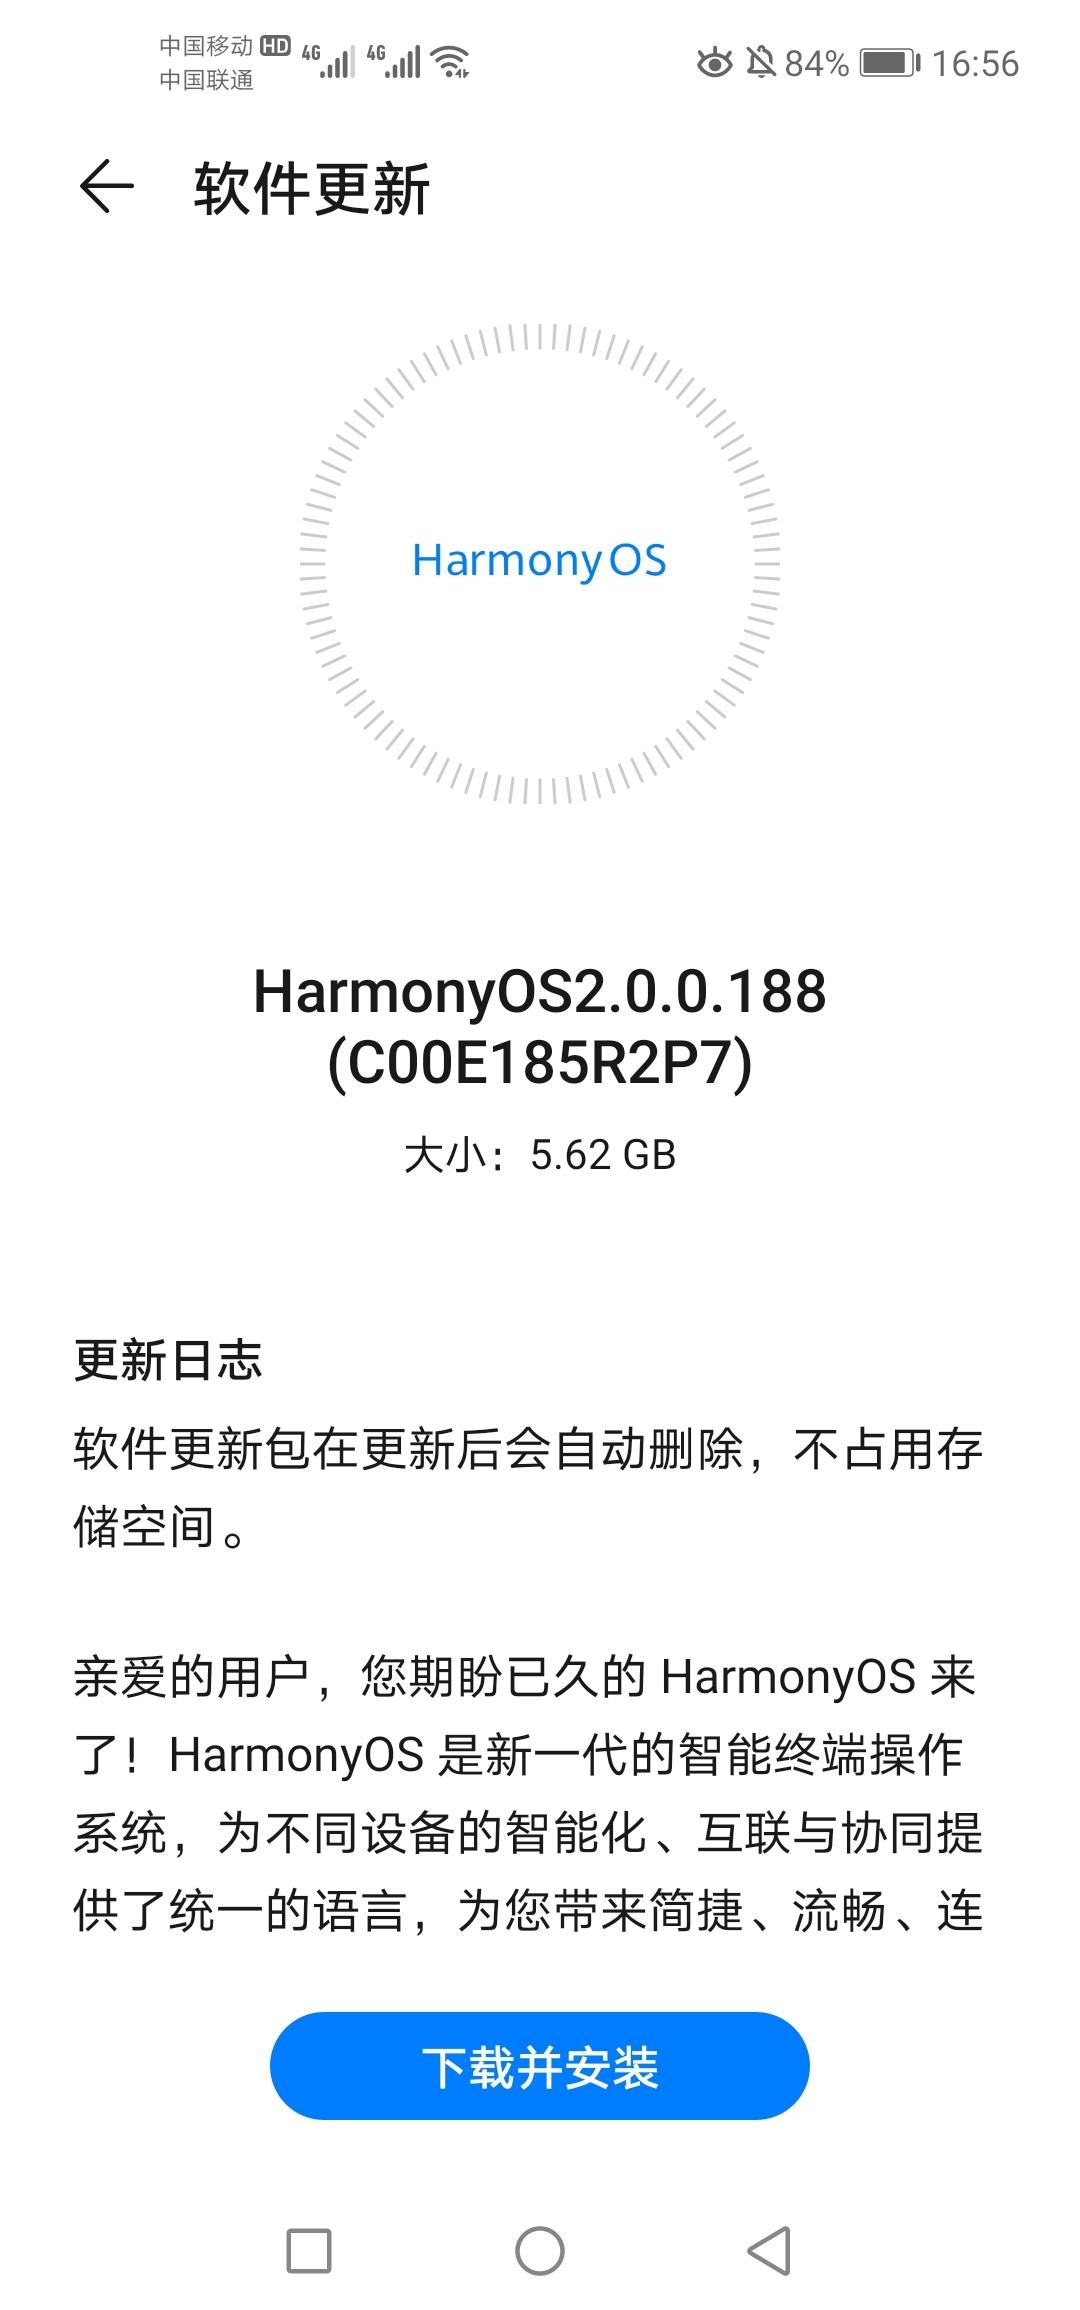 Screenshot_20210915_165620_com.huawei.android.hwouc.jpg